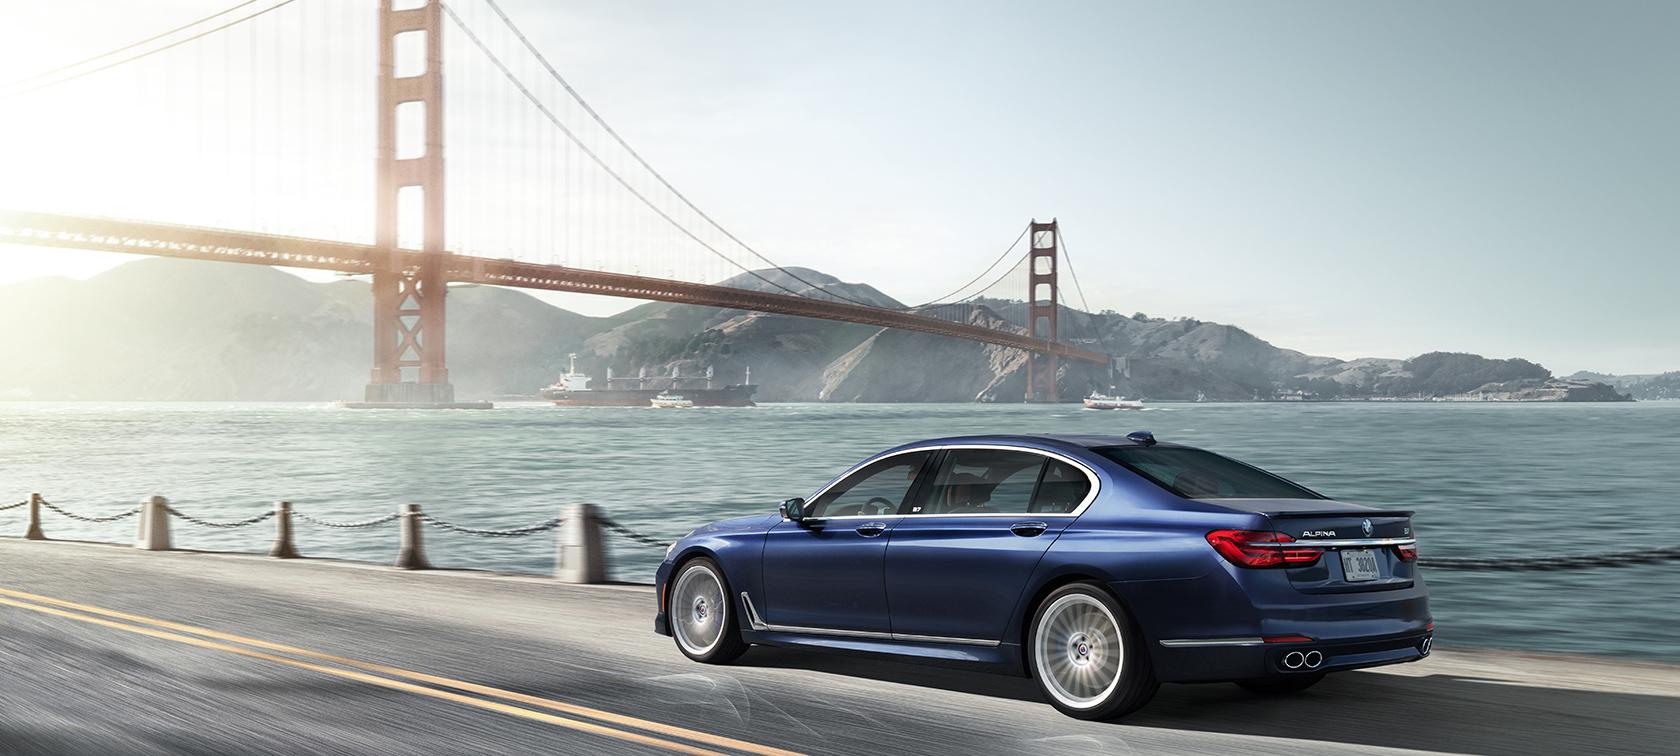 BMW Partnerships Alpina B Sedan Model BMW Canada - What is a bmw alpina b7